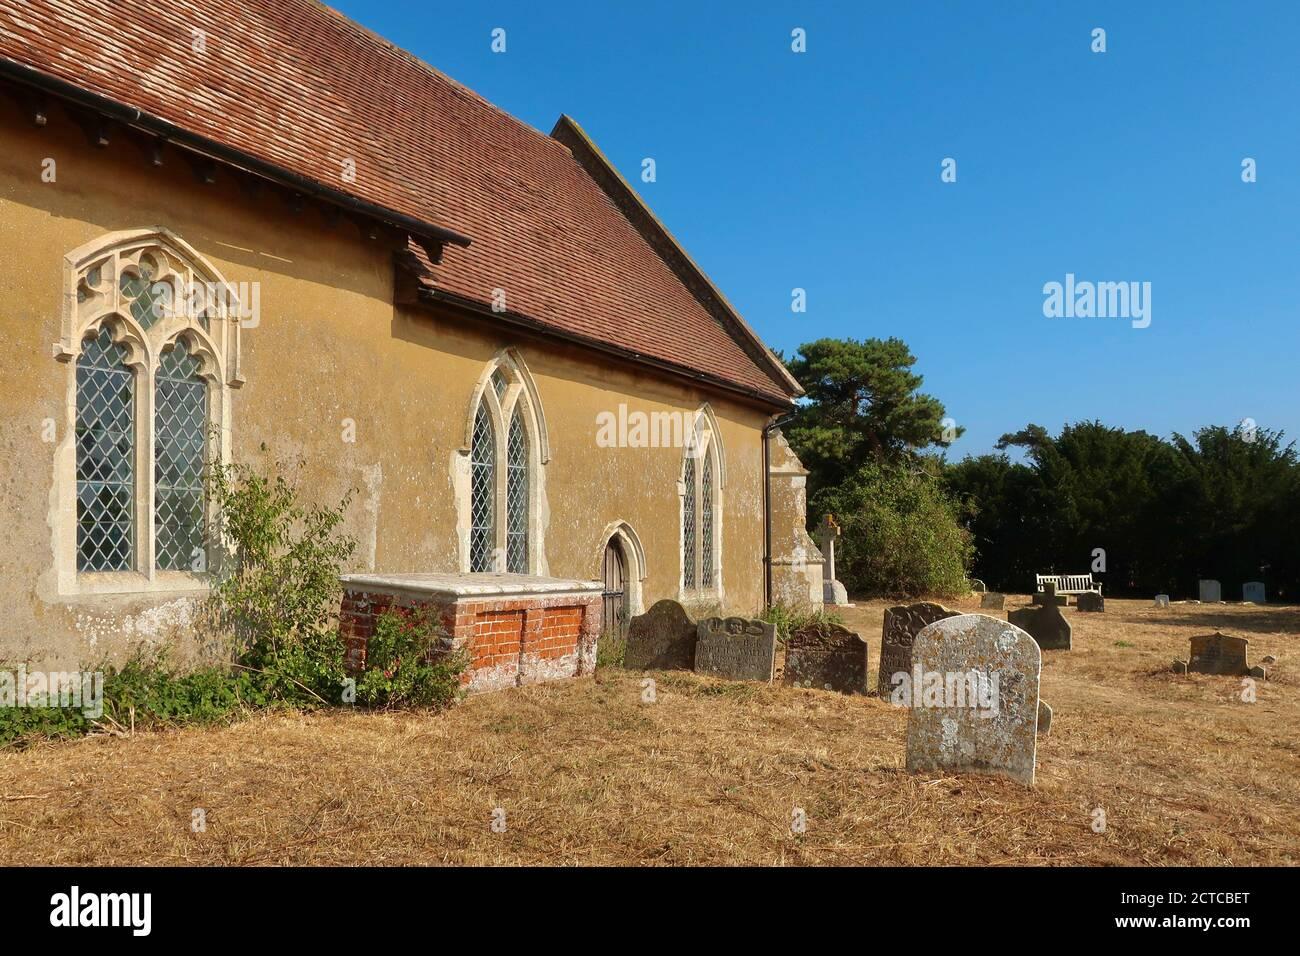 Ramsholt, Suffolk, UK - 22 September 2020: All Saints round tower church beside the River Deben. Stock Photo